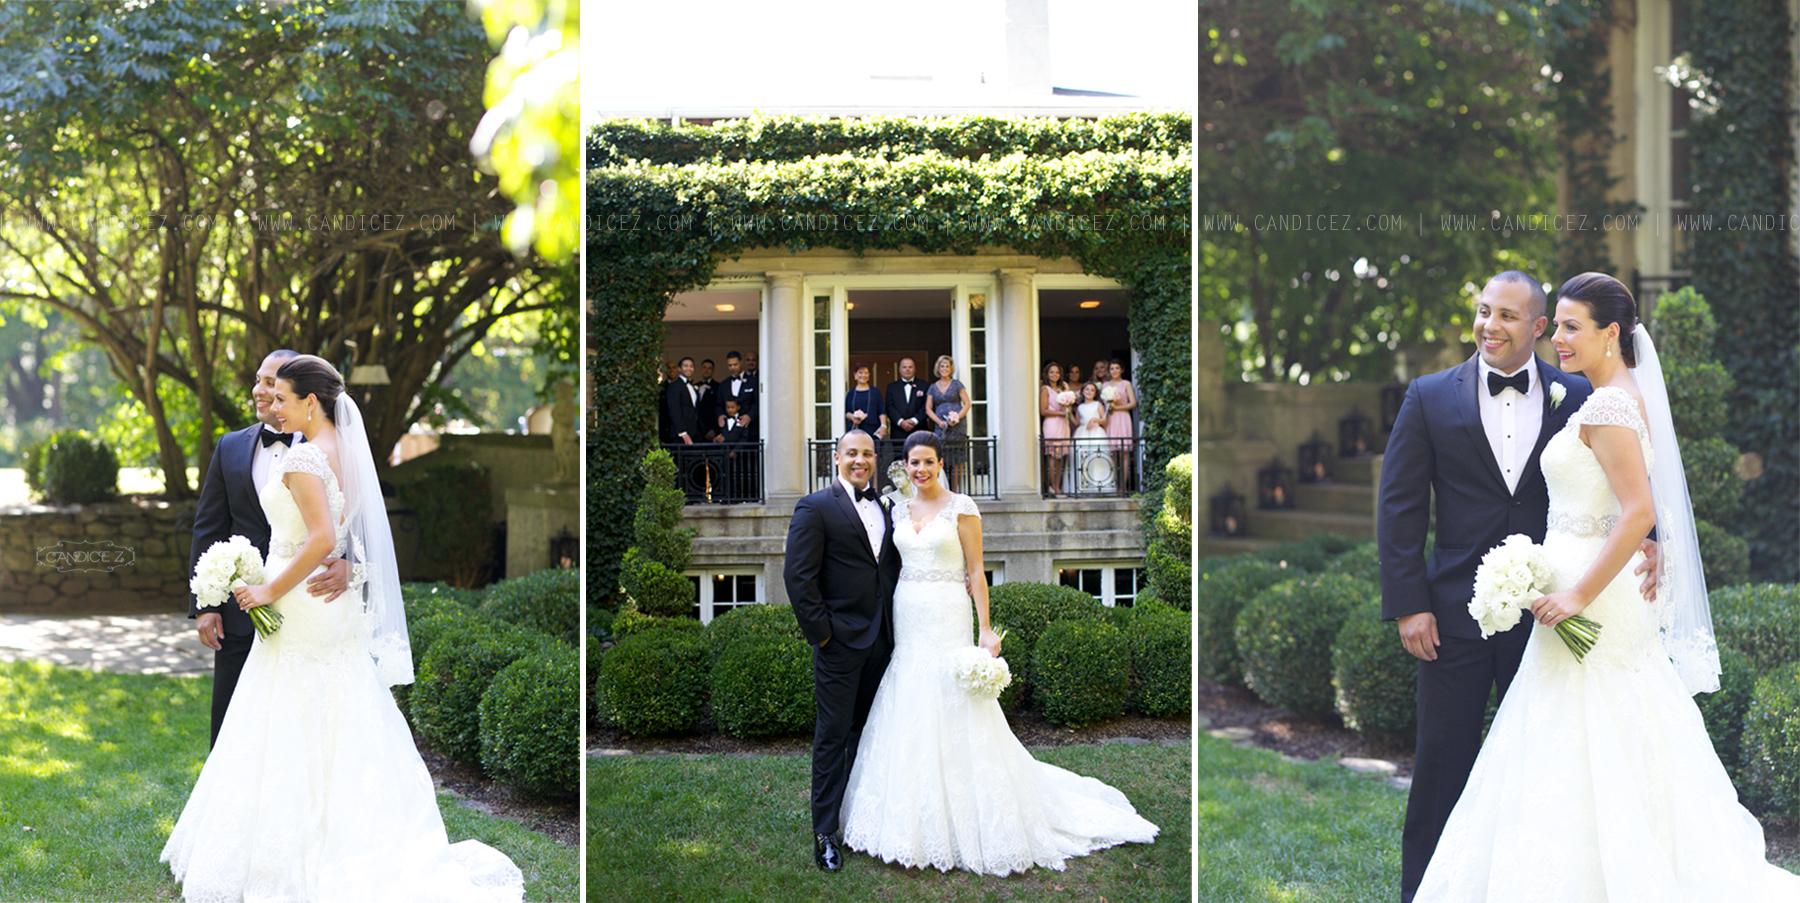 Lord_Thompson_CT_Wedding.jpg